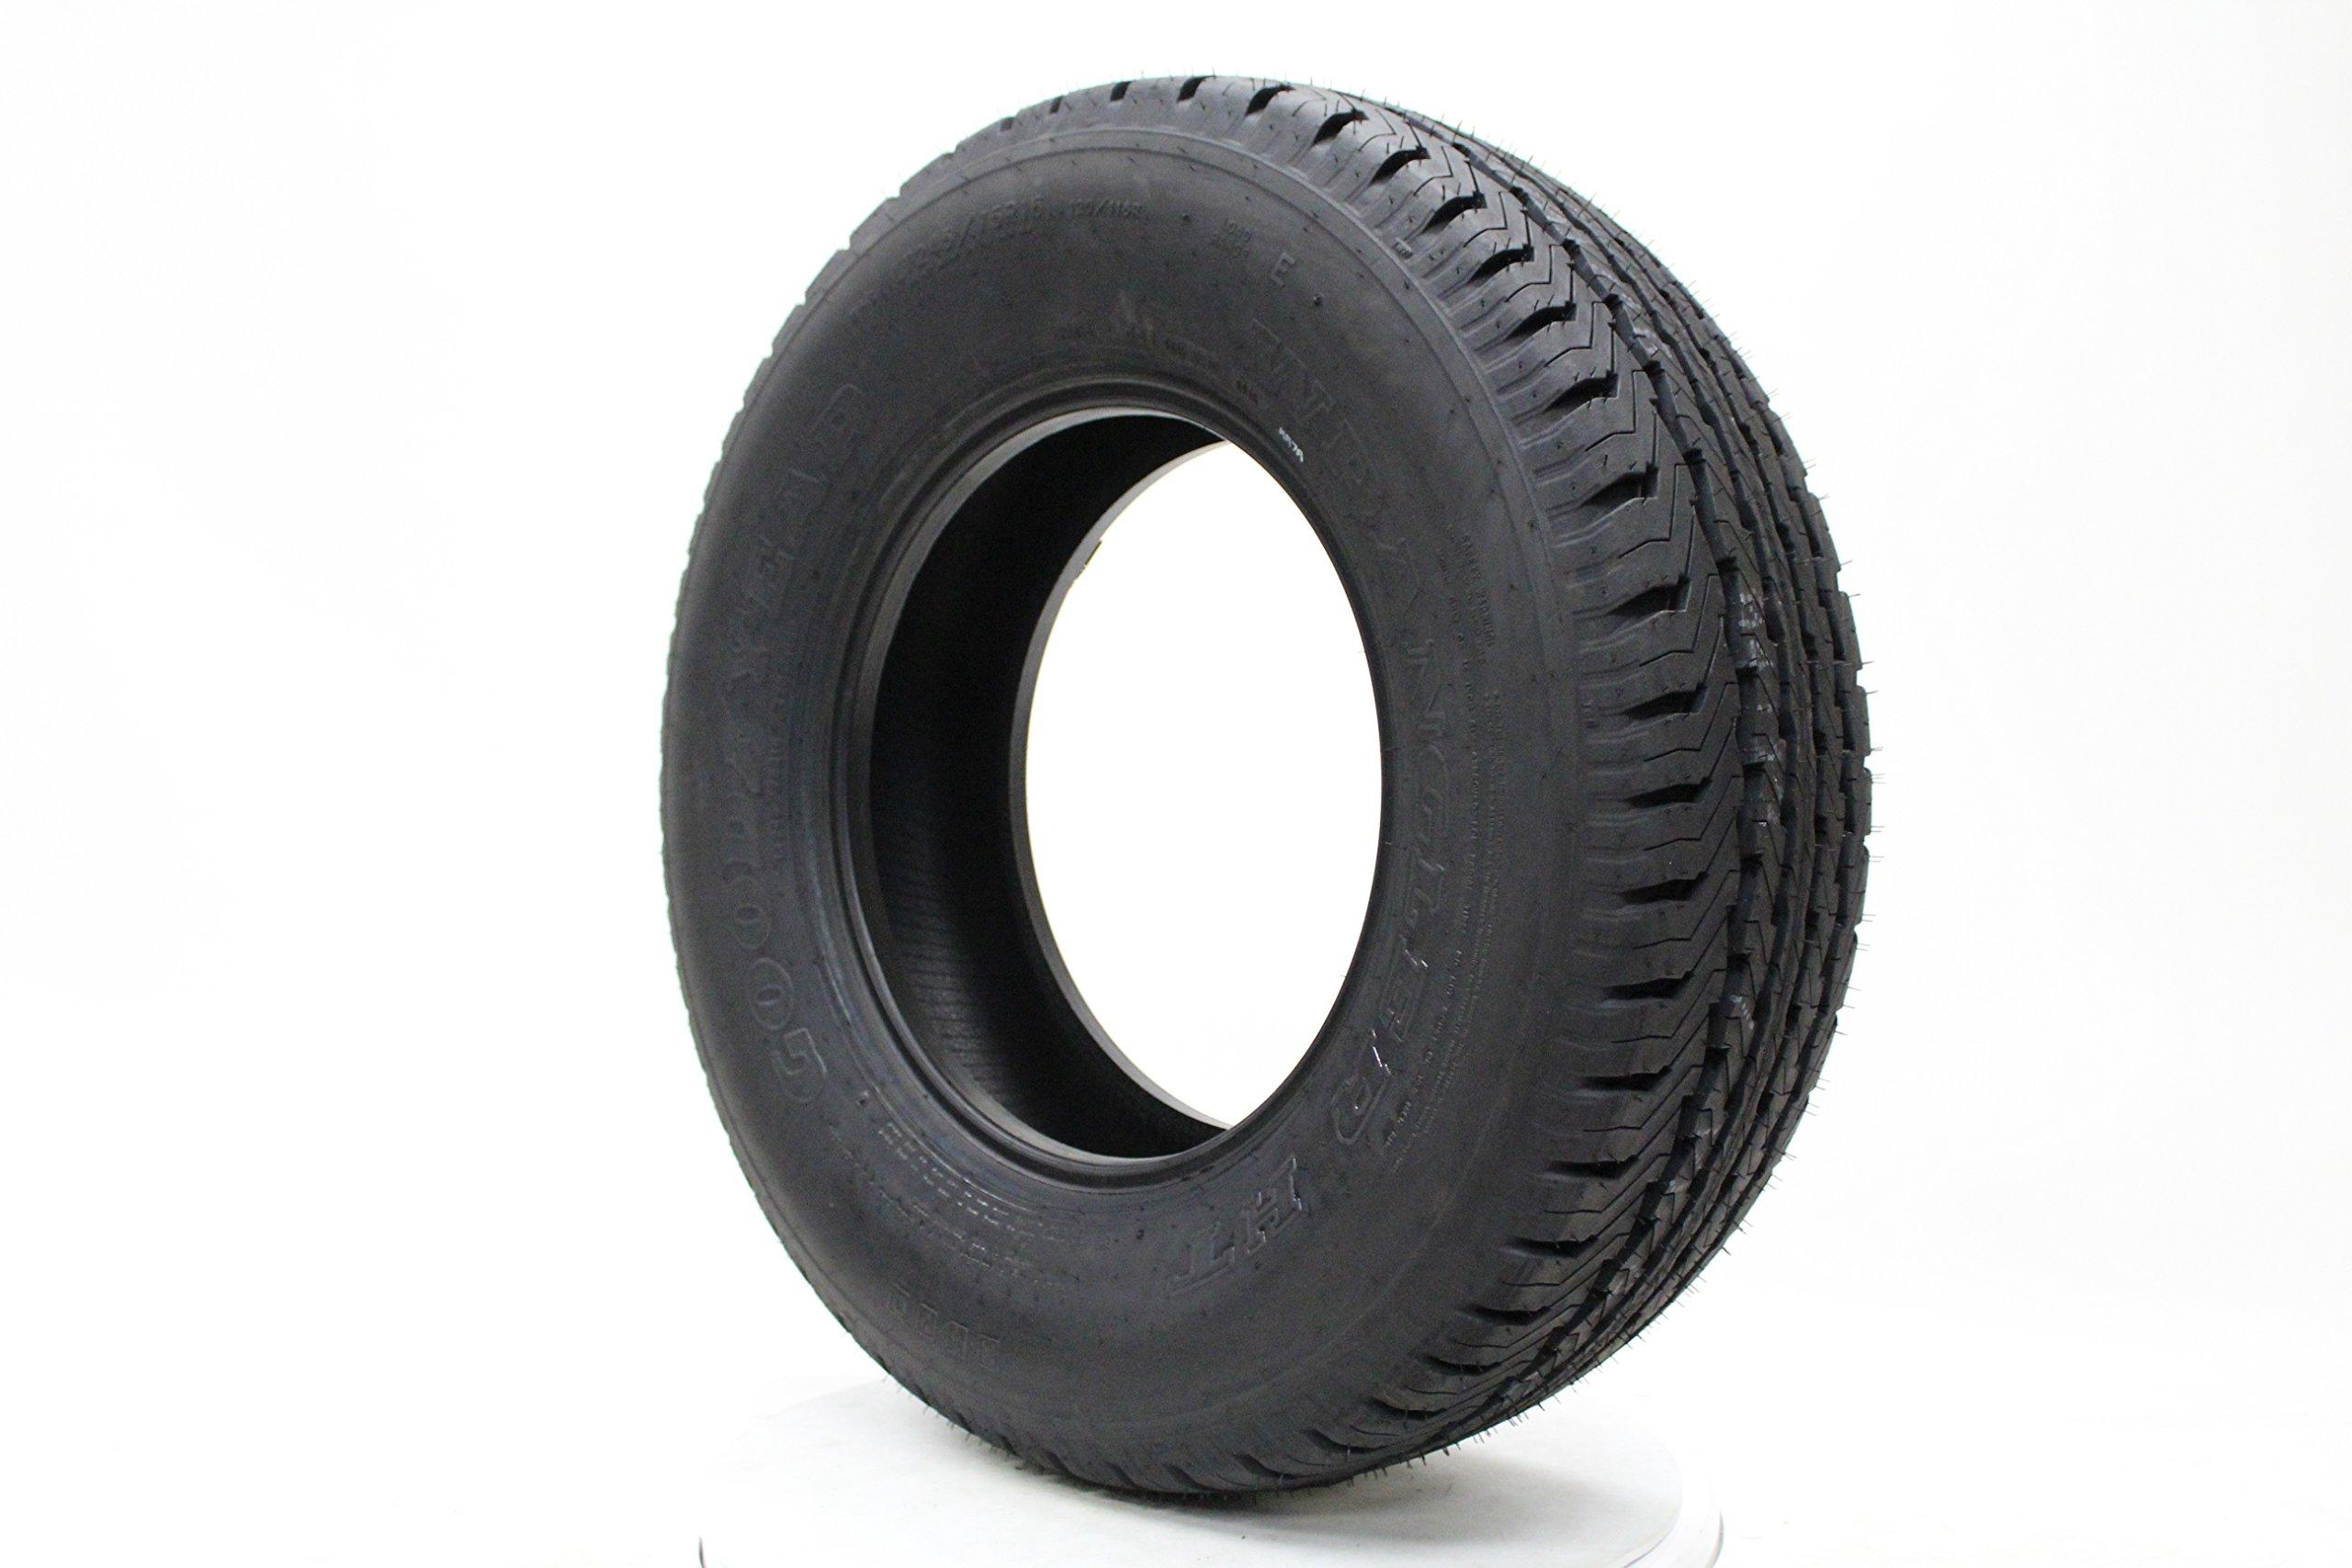 Goodyear Wrangler HT Tire - 245/75R16